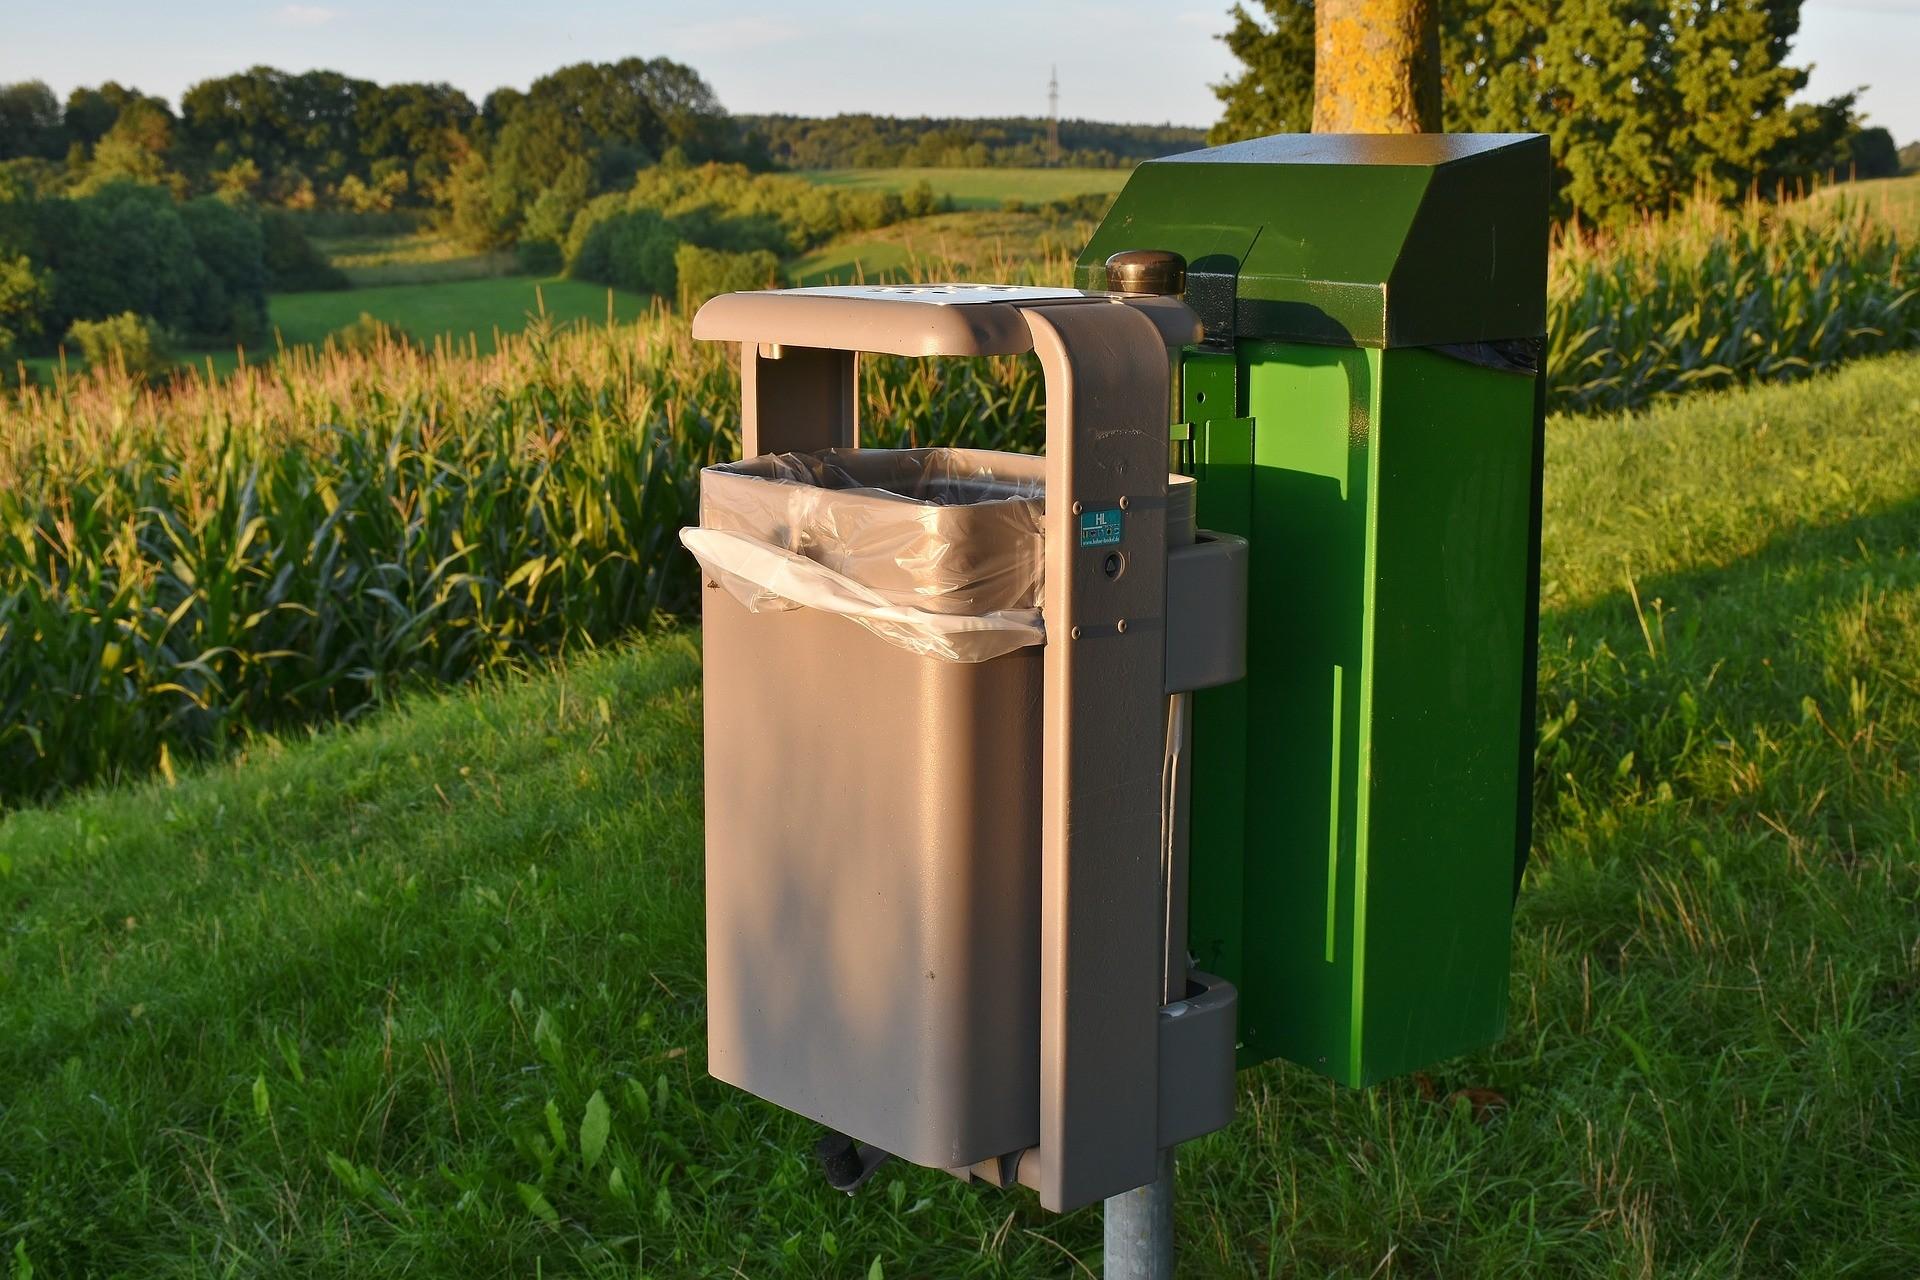 odpadkovy_kos_recyklace_recyklovany_plast_trideni_odpad